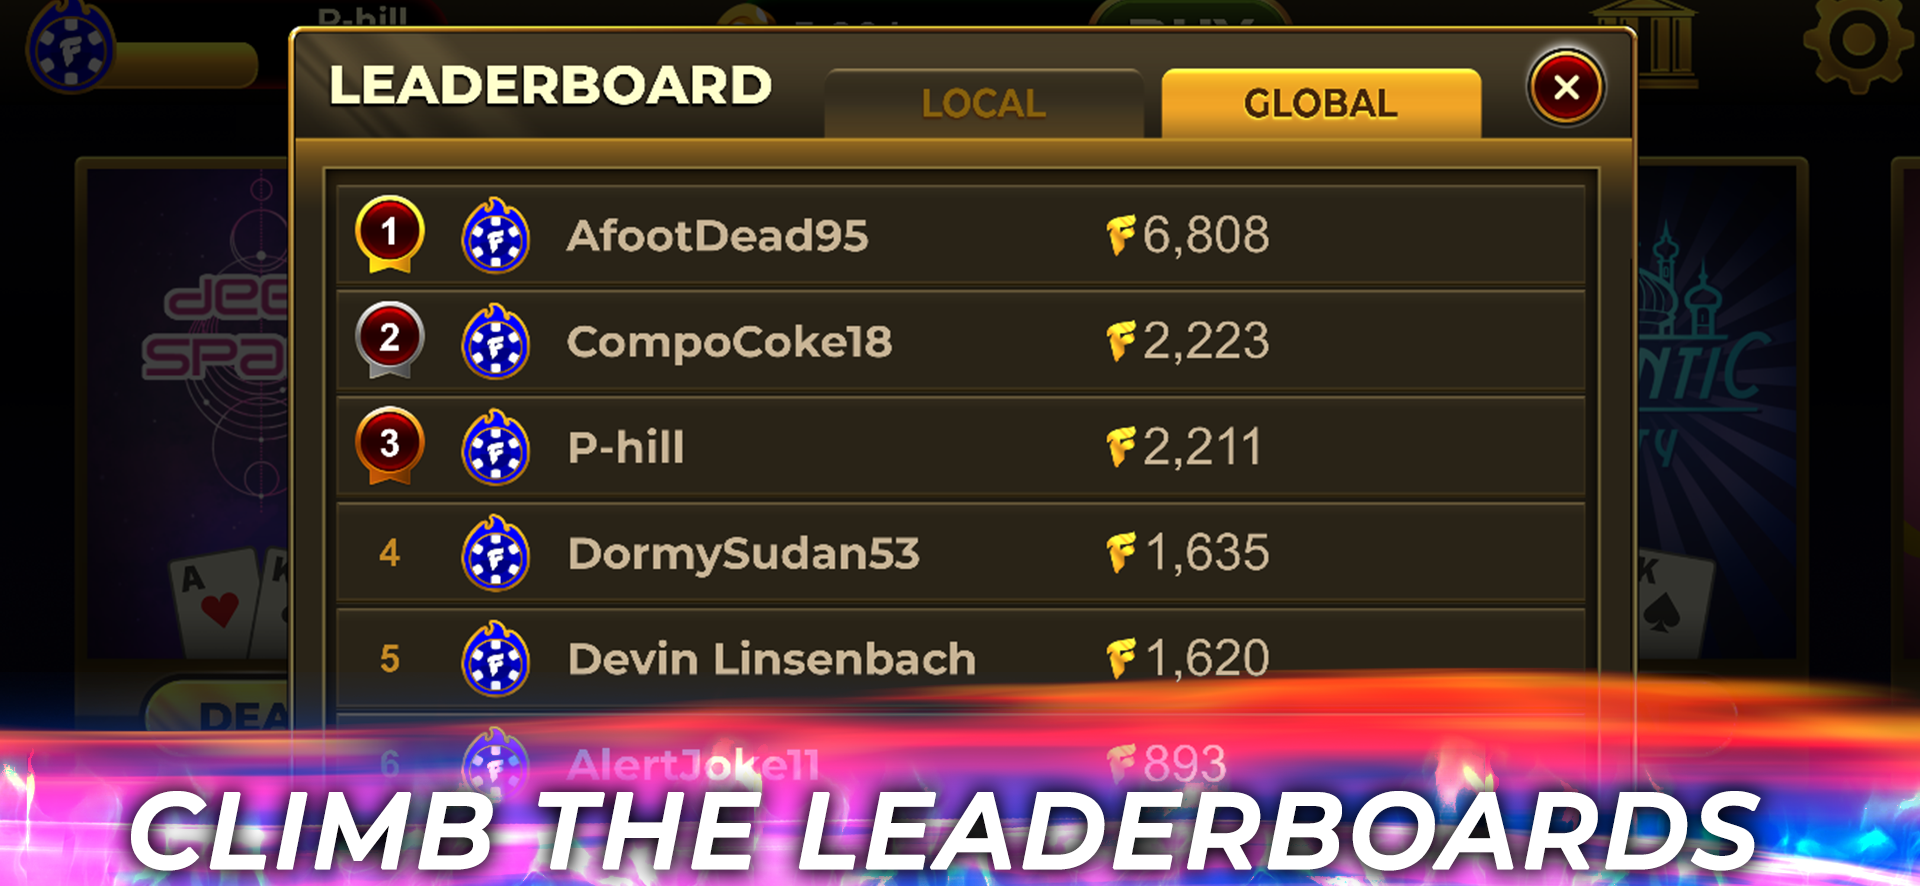 iphone6_5_leaderboards_screen.png